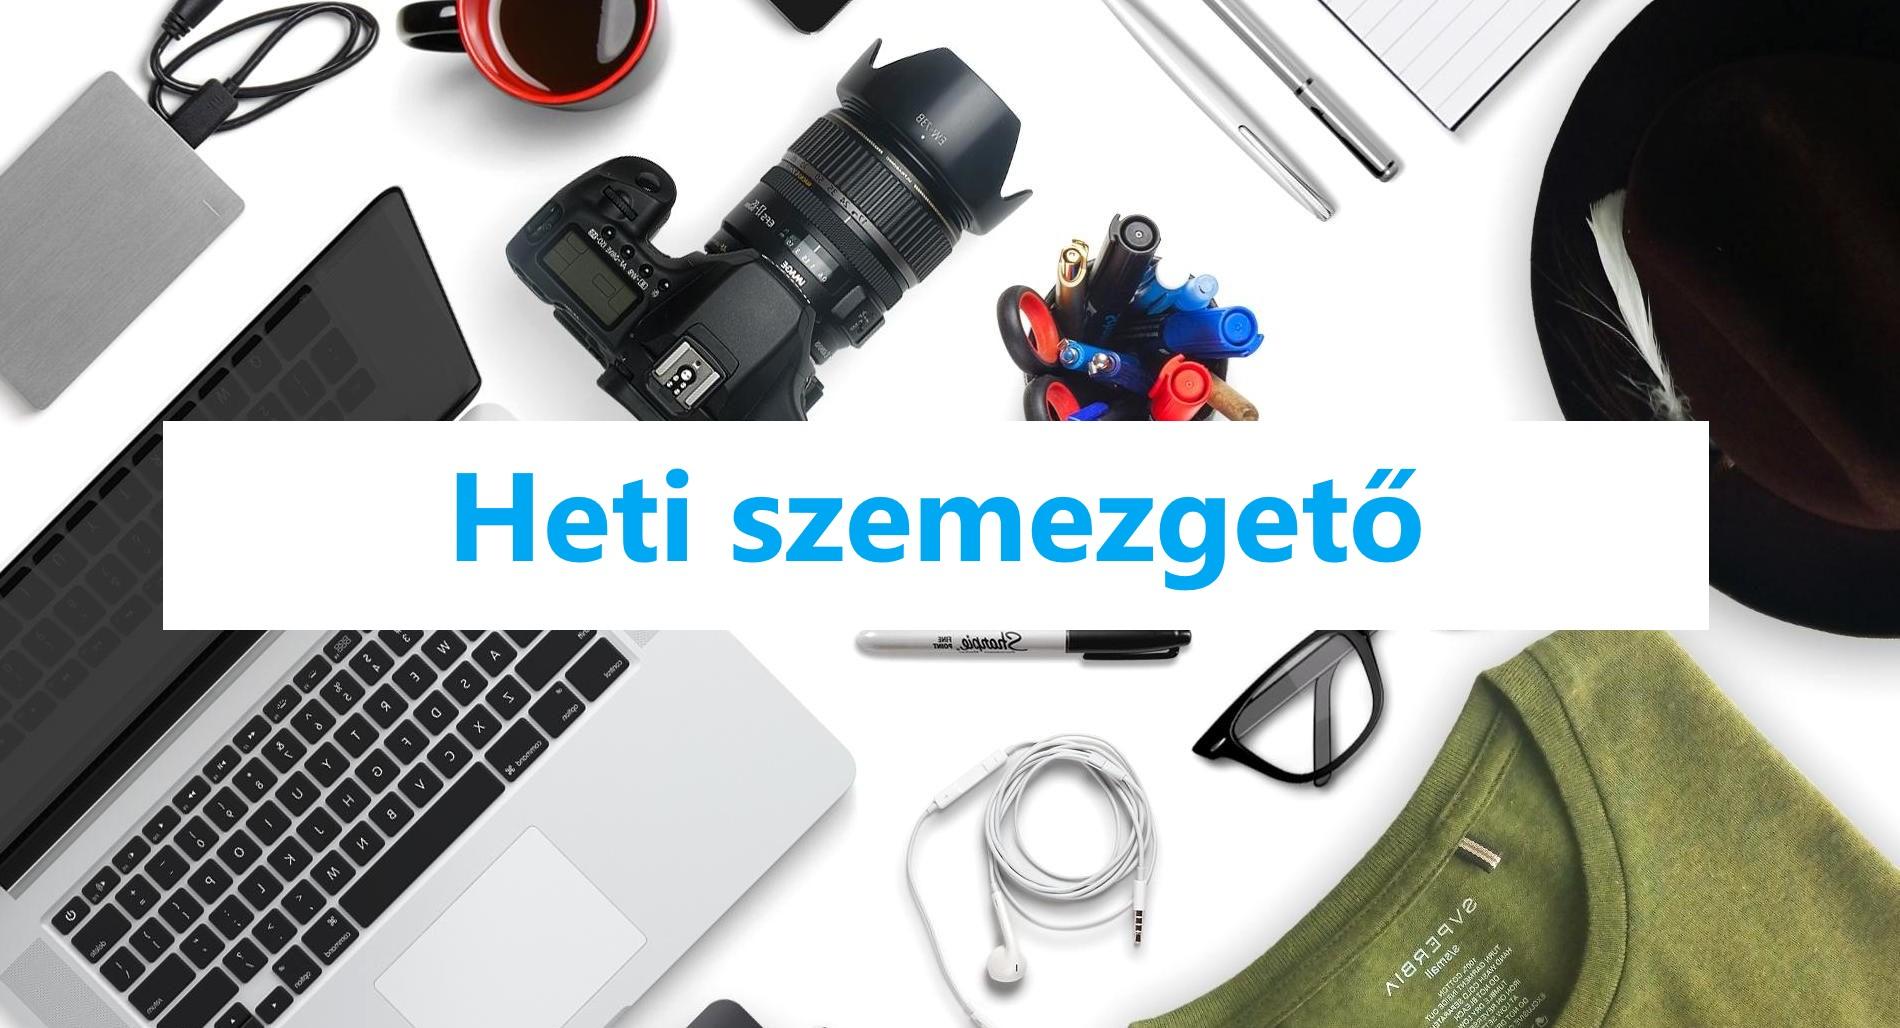 heti_szemezgeto_uj_35.jpg